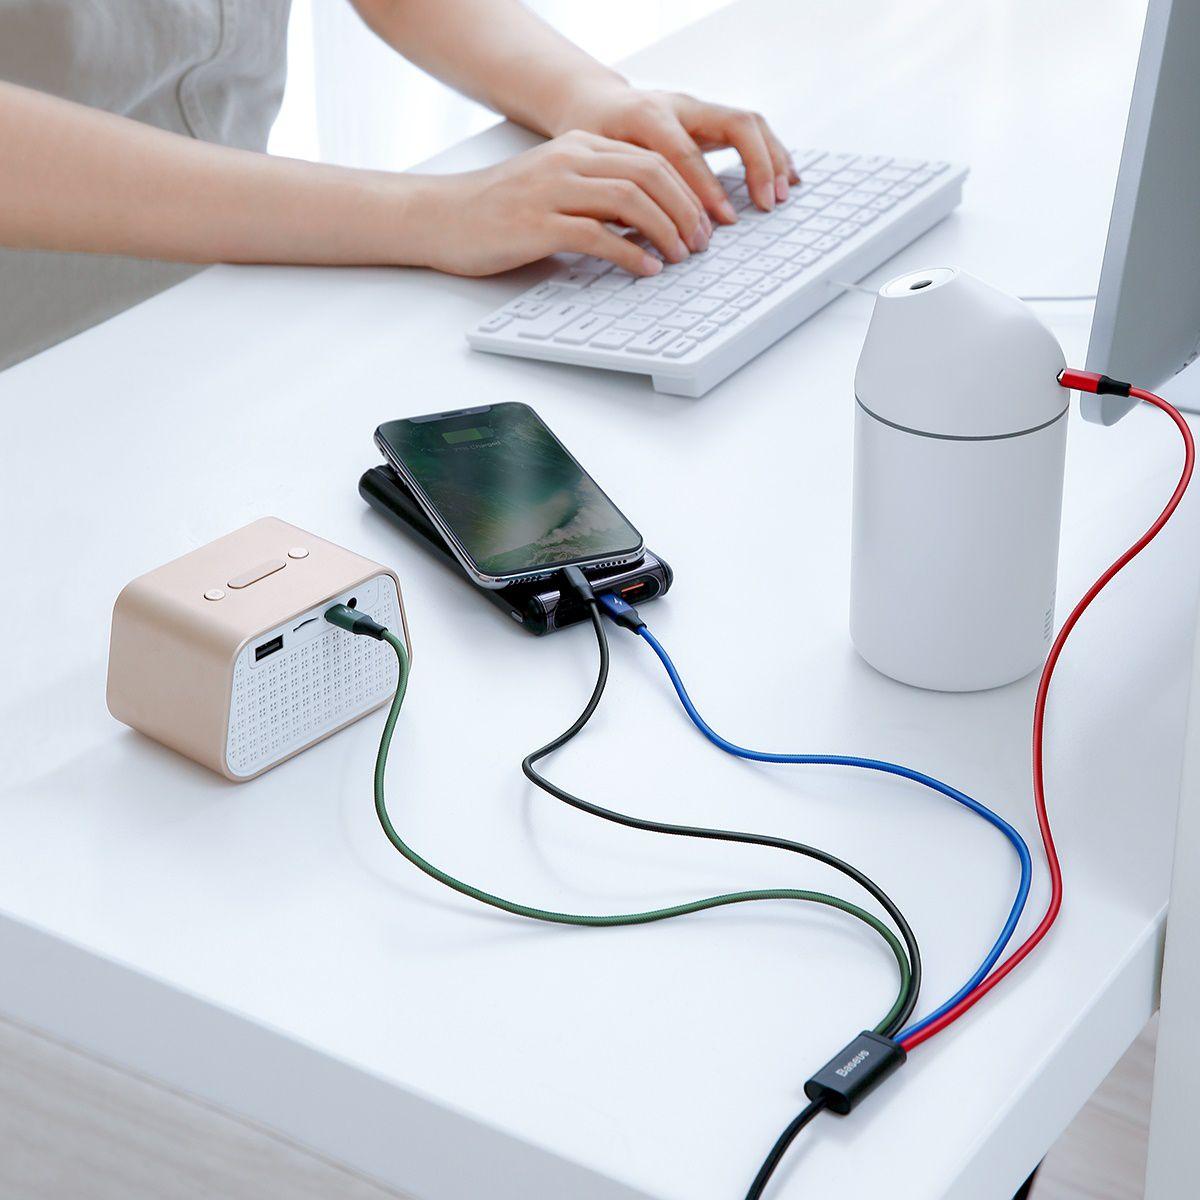 Cabo 4n1 Baseus Lightning + 2 Type-C + Micro USB 3.5A 1.2m